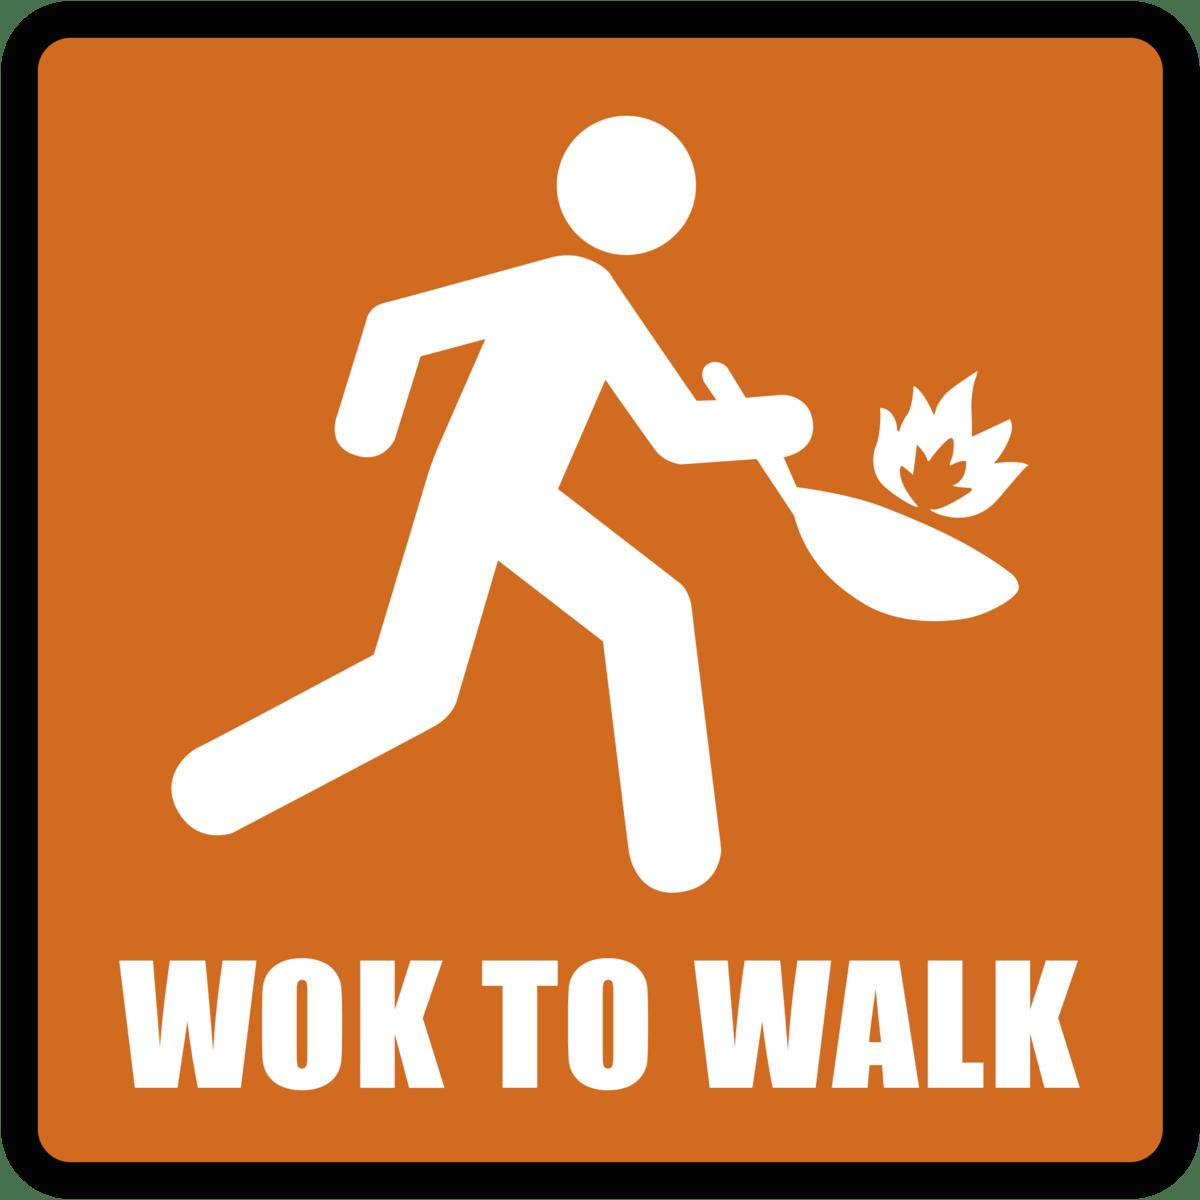 Wok to Walk  Wikipedia